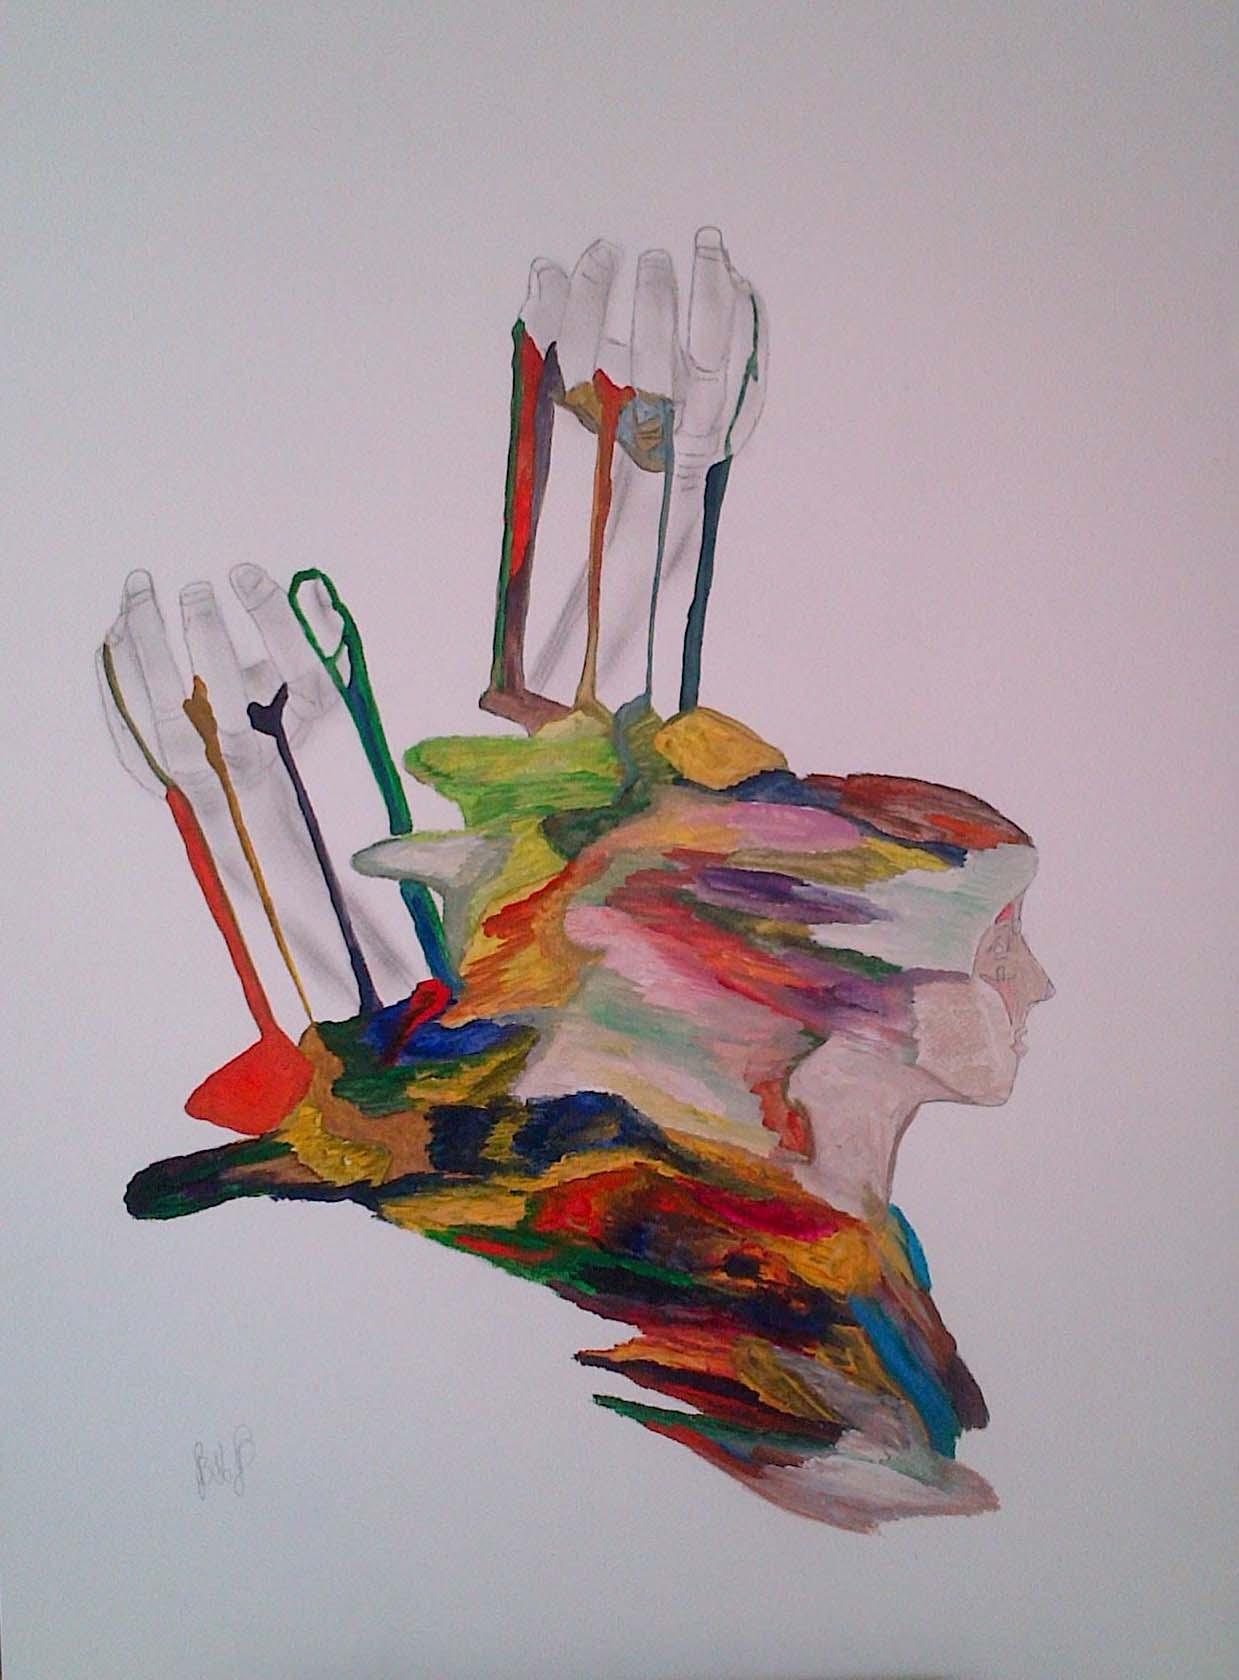 bd-aquarelle-n-856-artiste-2